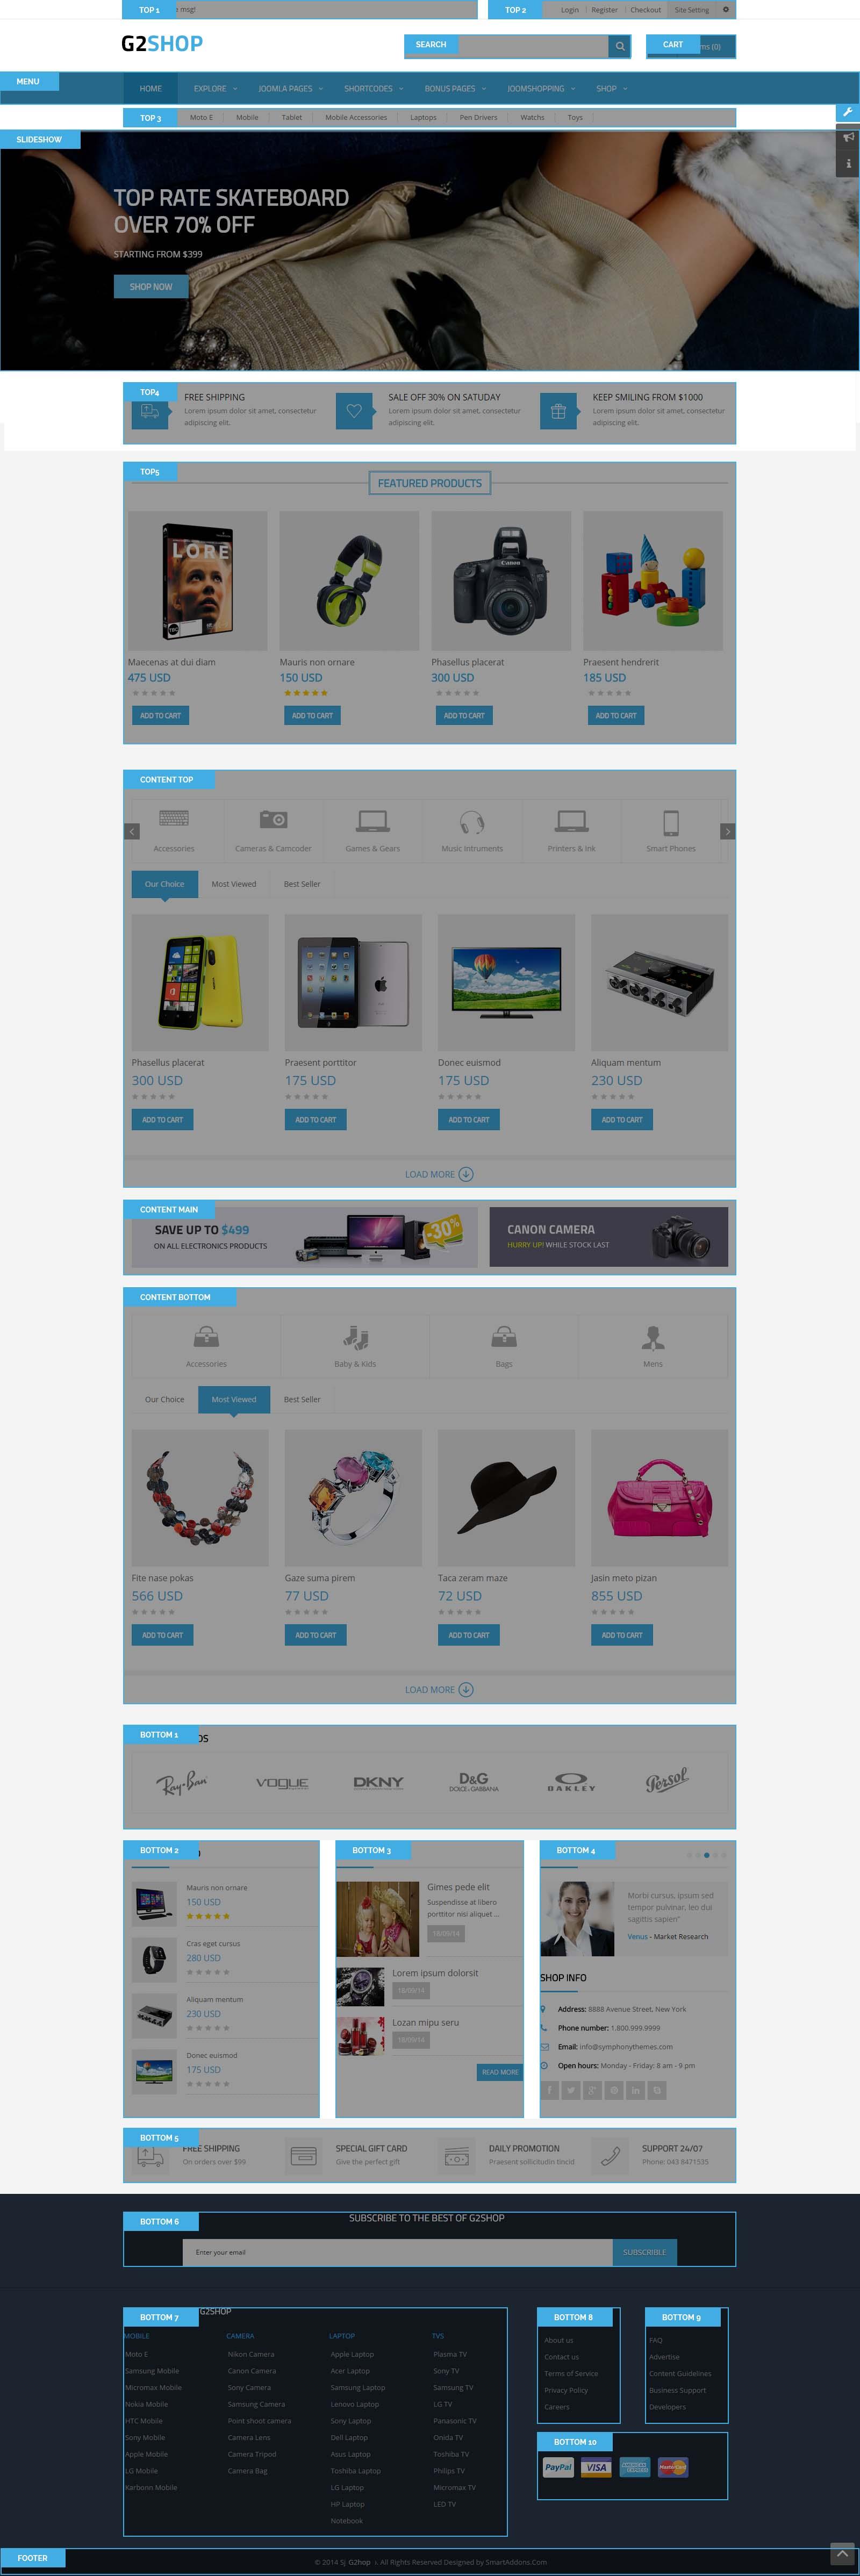 Responsive Joomla eCommerce Template for JoomShopping - SJ G2Shop